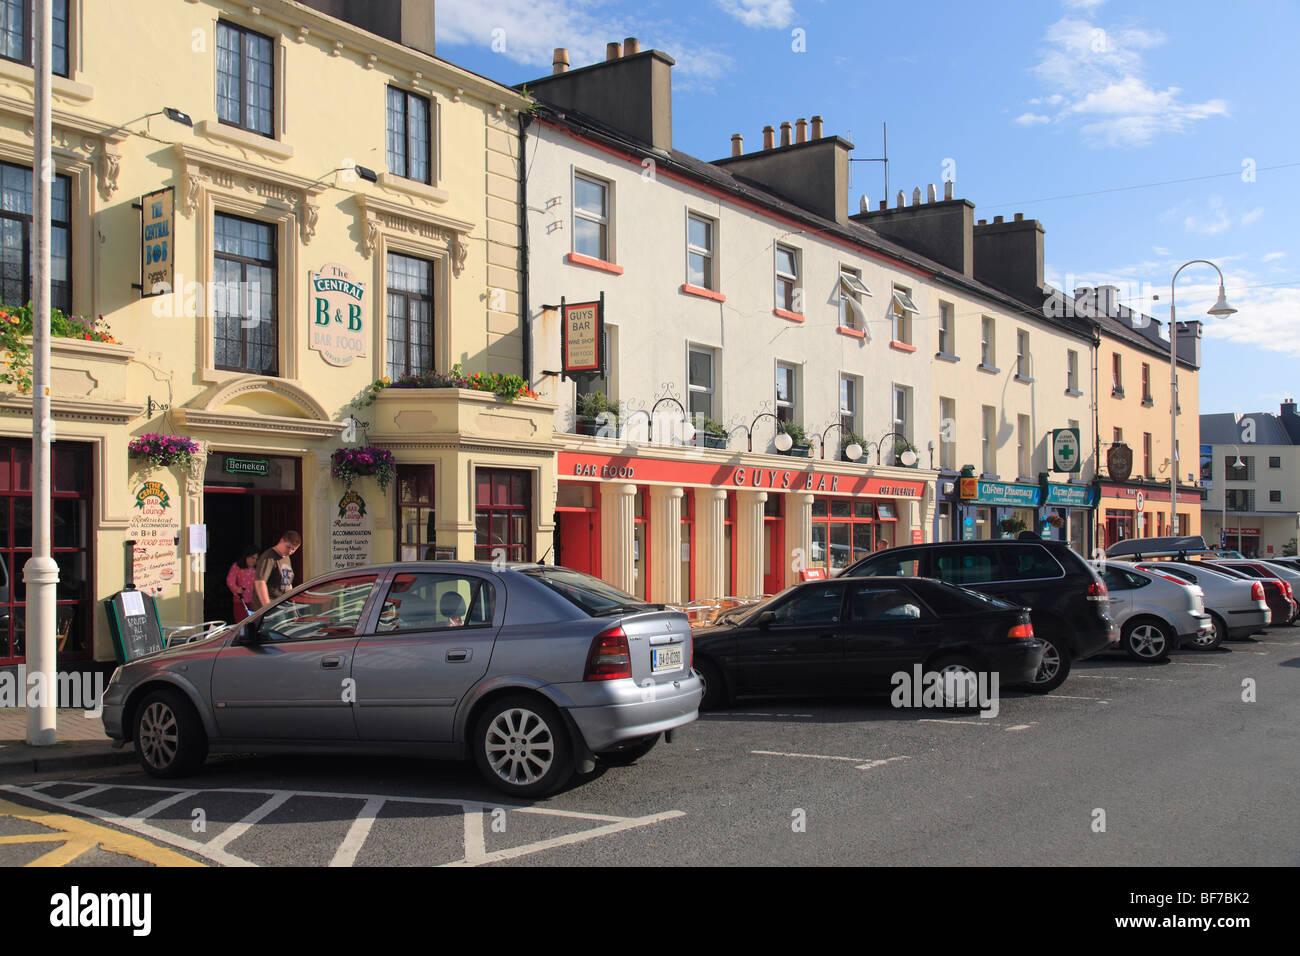 The 10 best B&Bs in Clifden, Ireland | potteriespowertransmission.co.uk